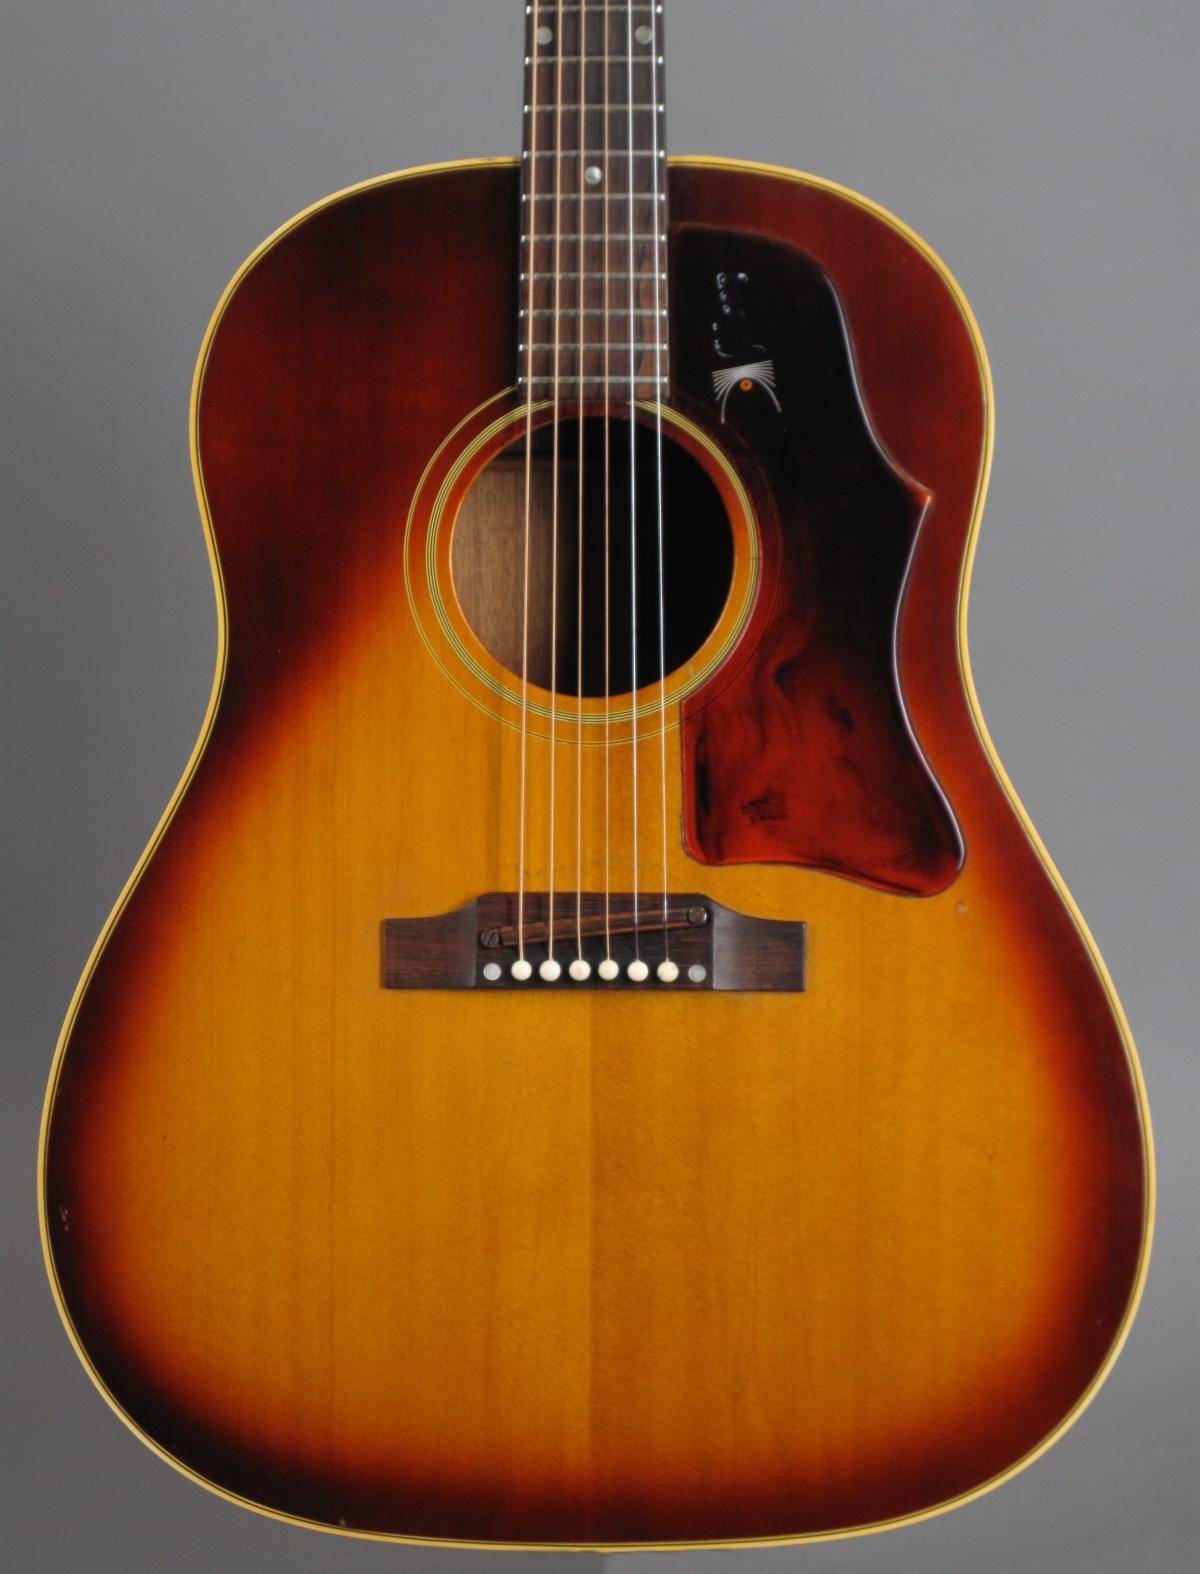 1968 Gibson J-45 - Sunburst